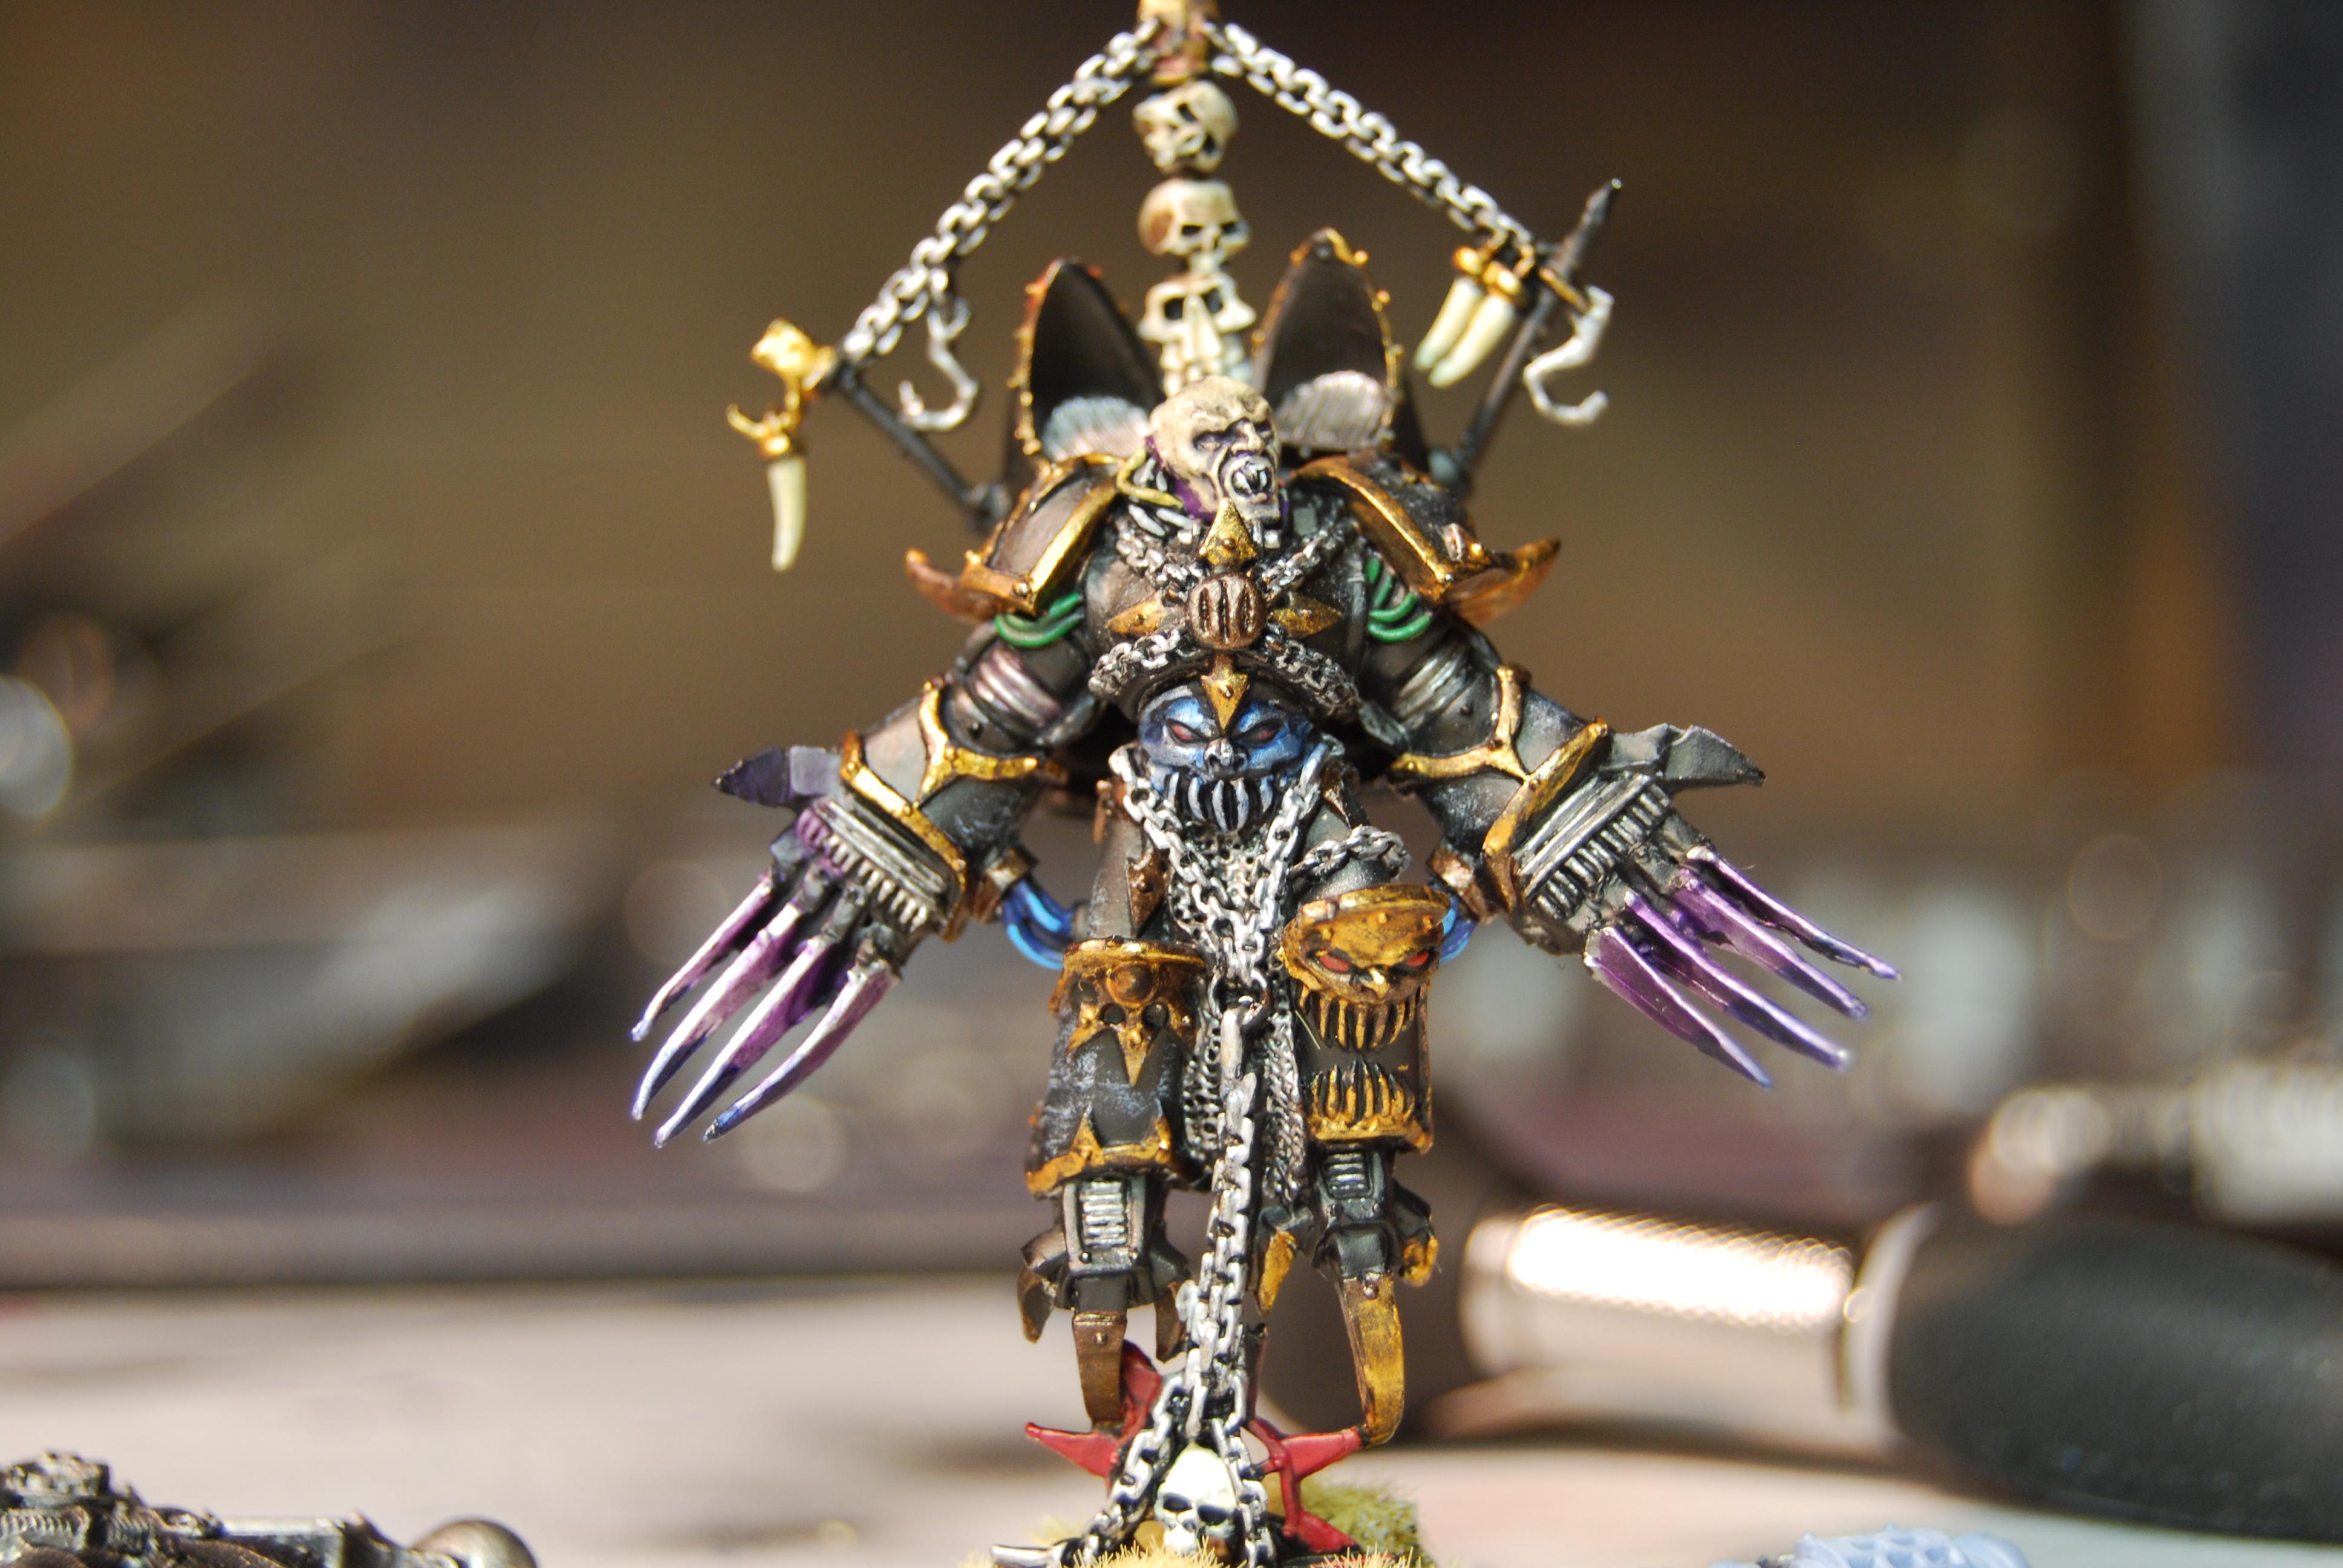 Black Legion, Chaos, Chaos Lord, Jump Pack, Painted, Warhammer 40,000